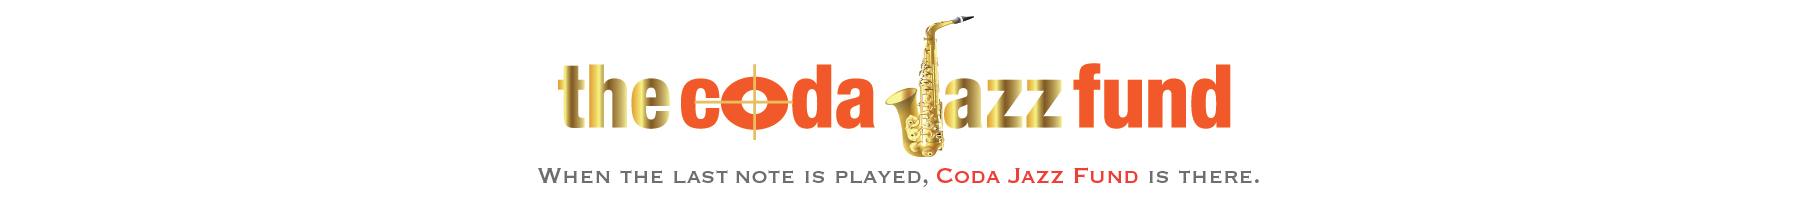 CodaJazzFund_Logo3